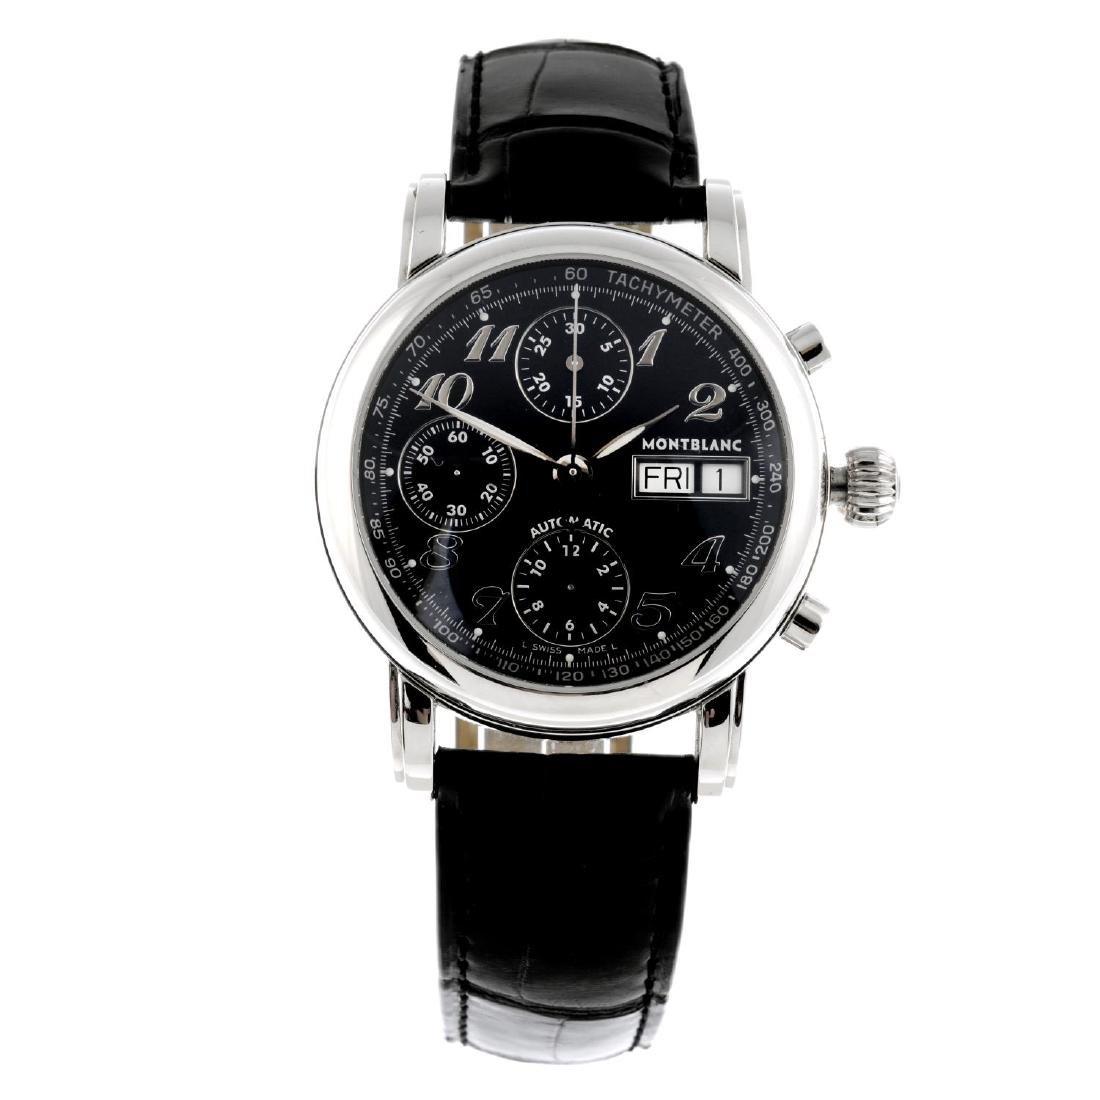 MONTBLANC - a gentleman's Meisterstuck chronograph